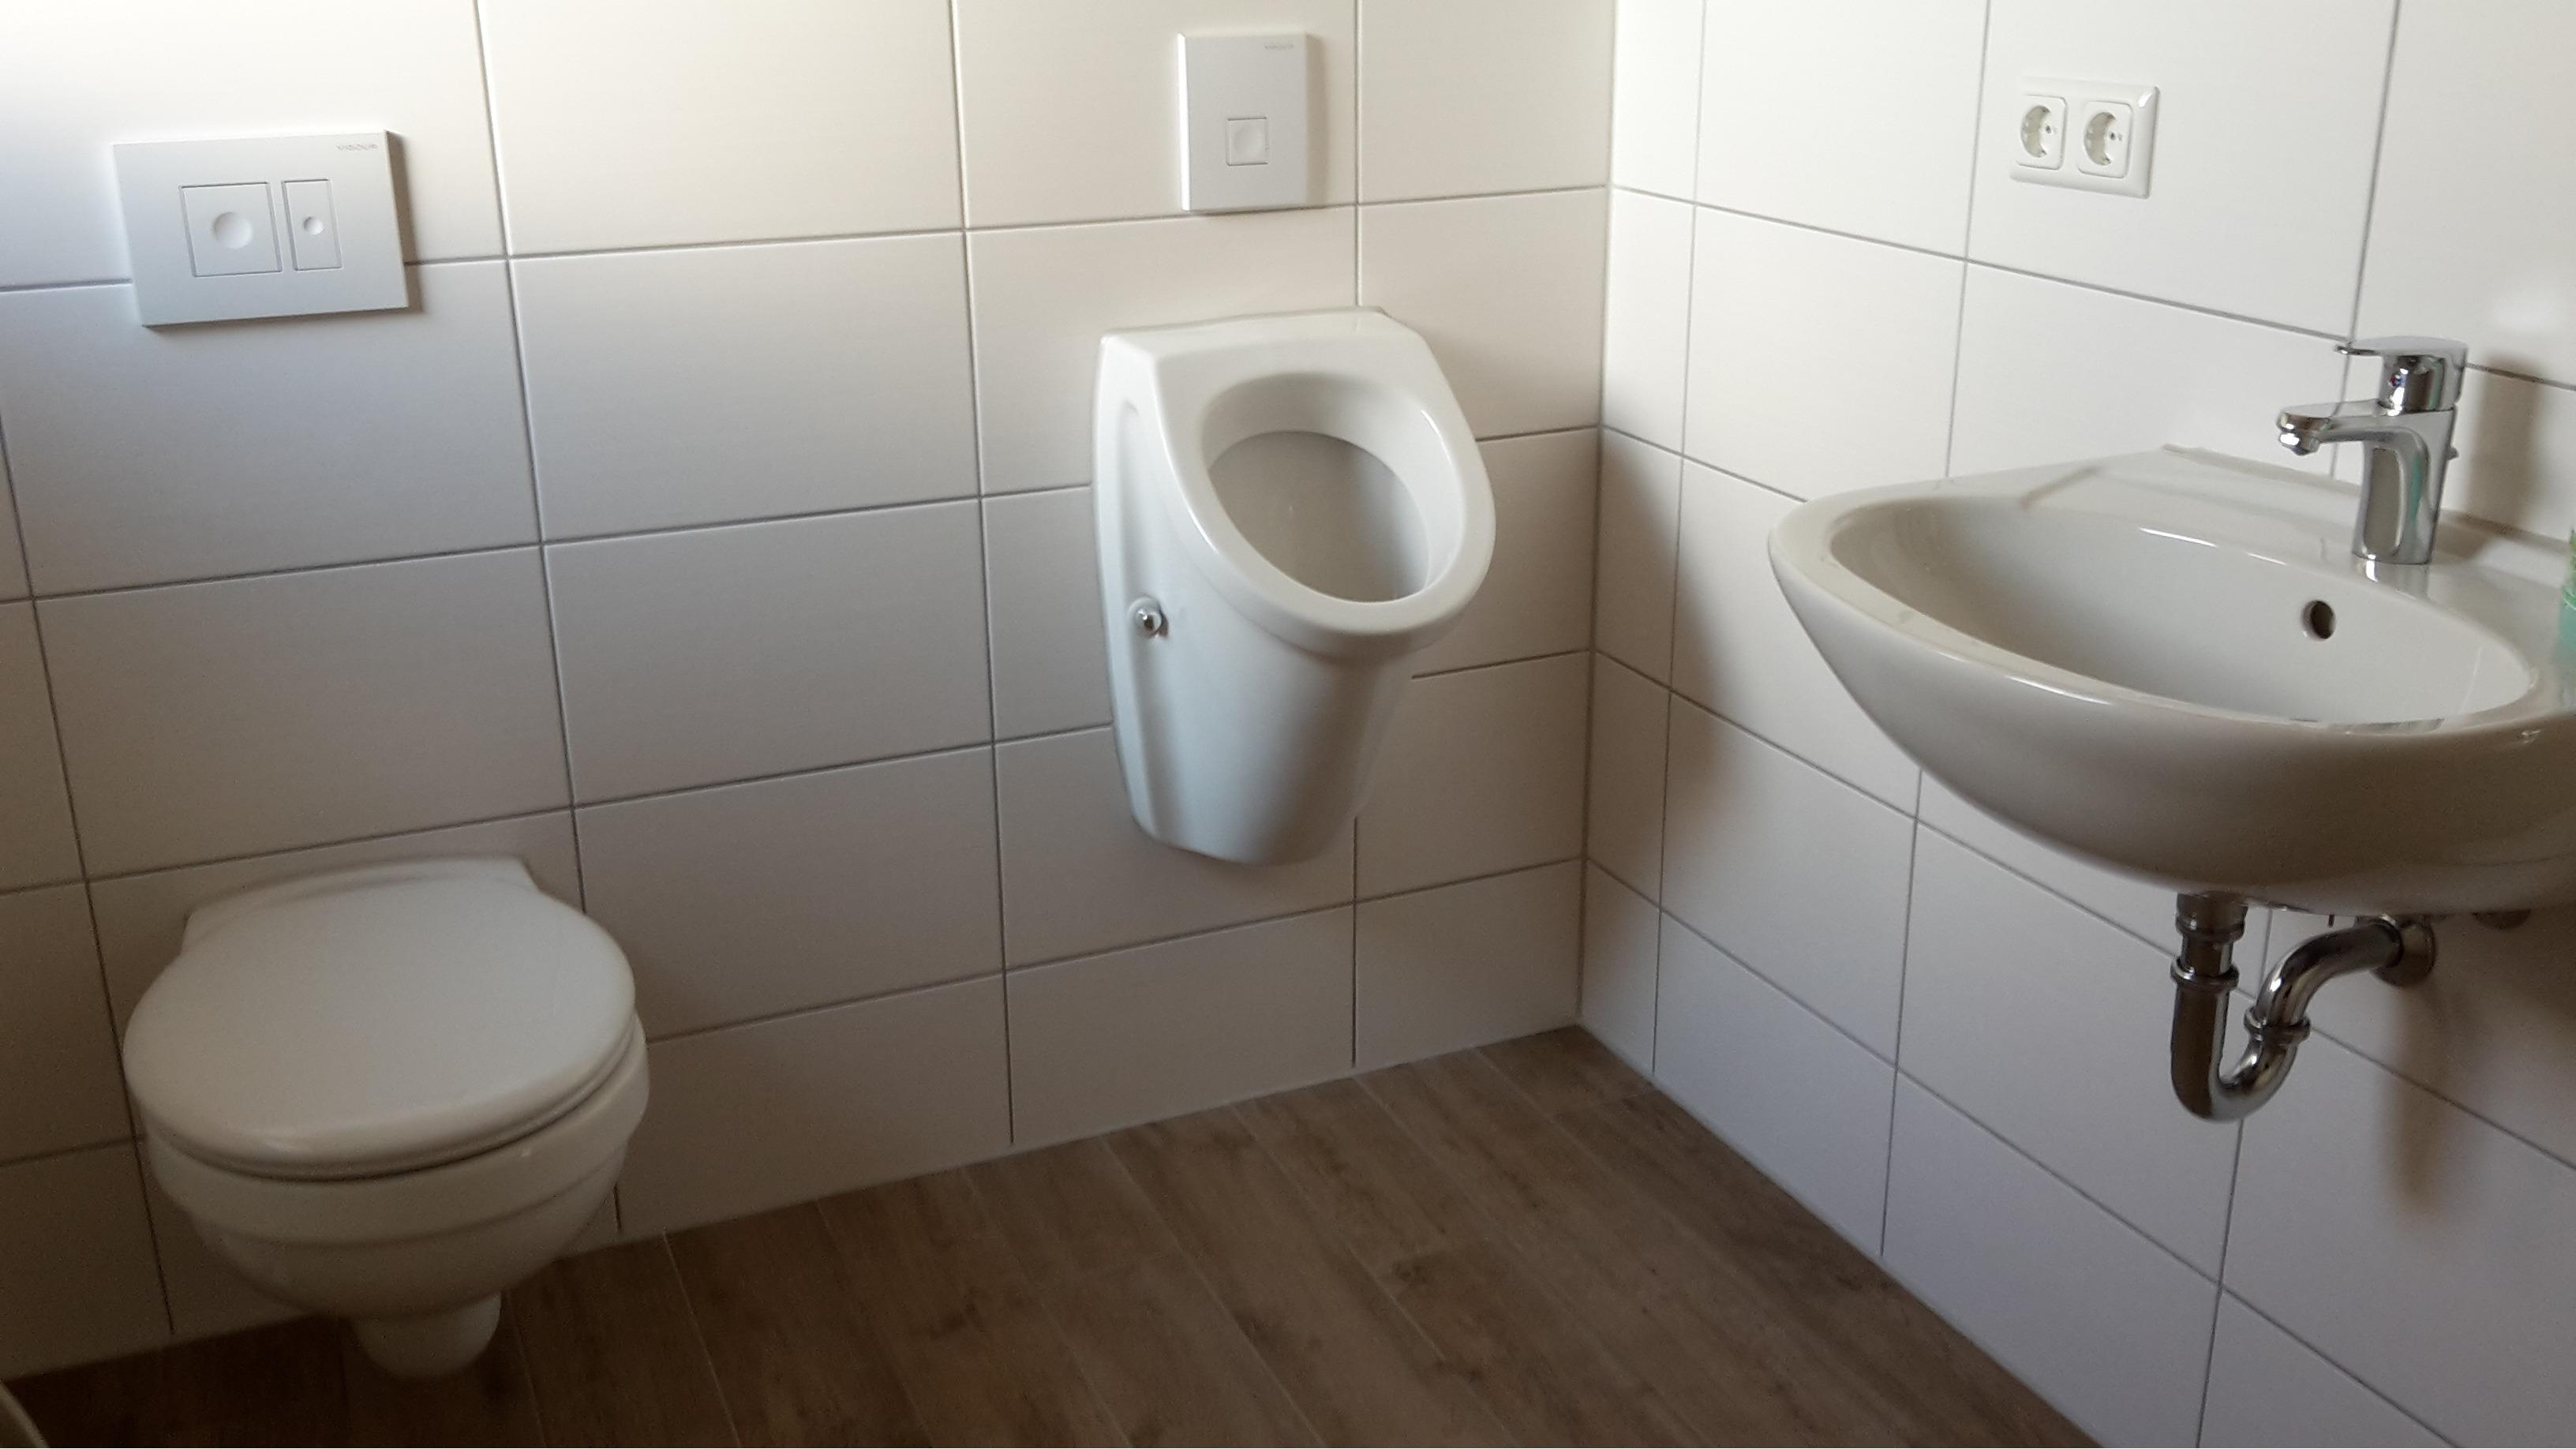 damgartener baufirma meisterbetrieb z lsdorf ribnitz damgarten kontaktieren. Black Bedroom Furniture Sets. Home Design Ideas